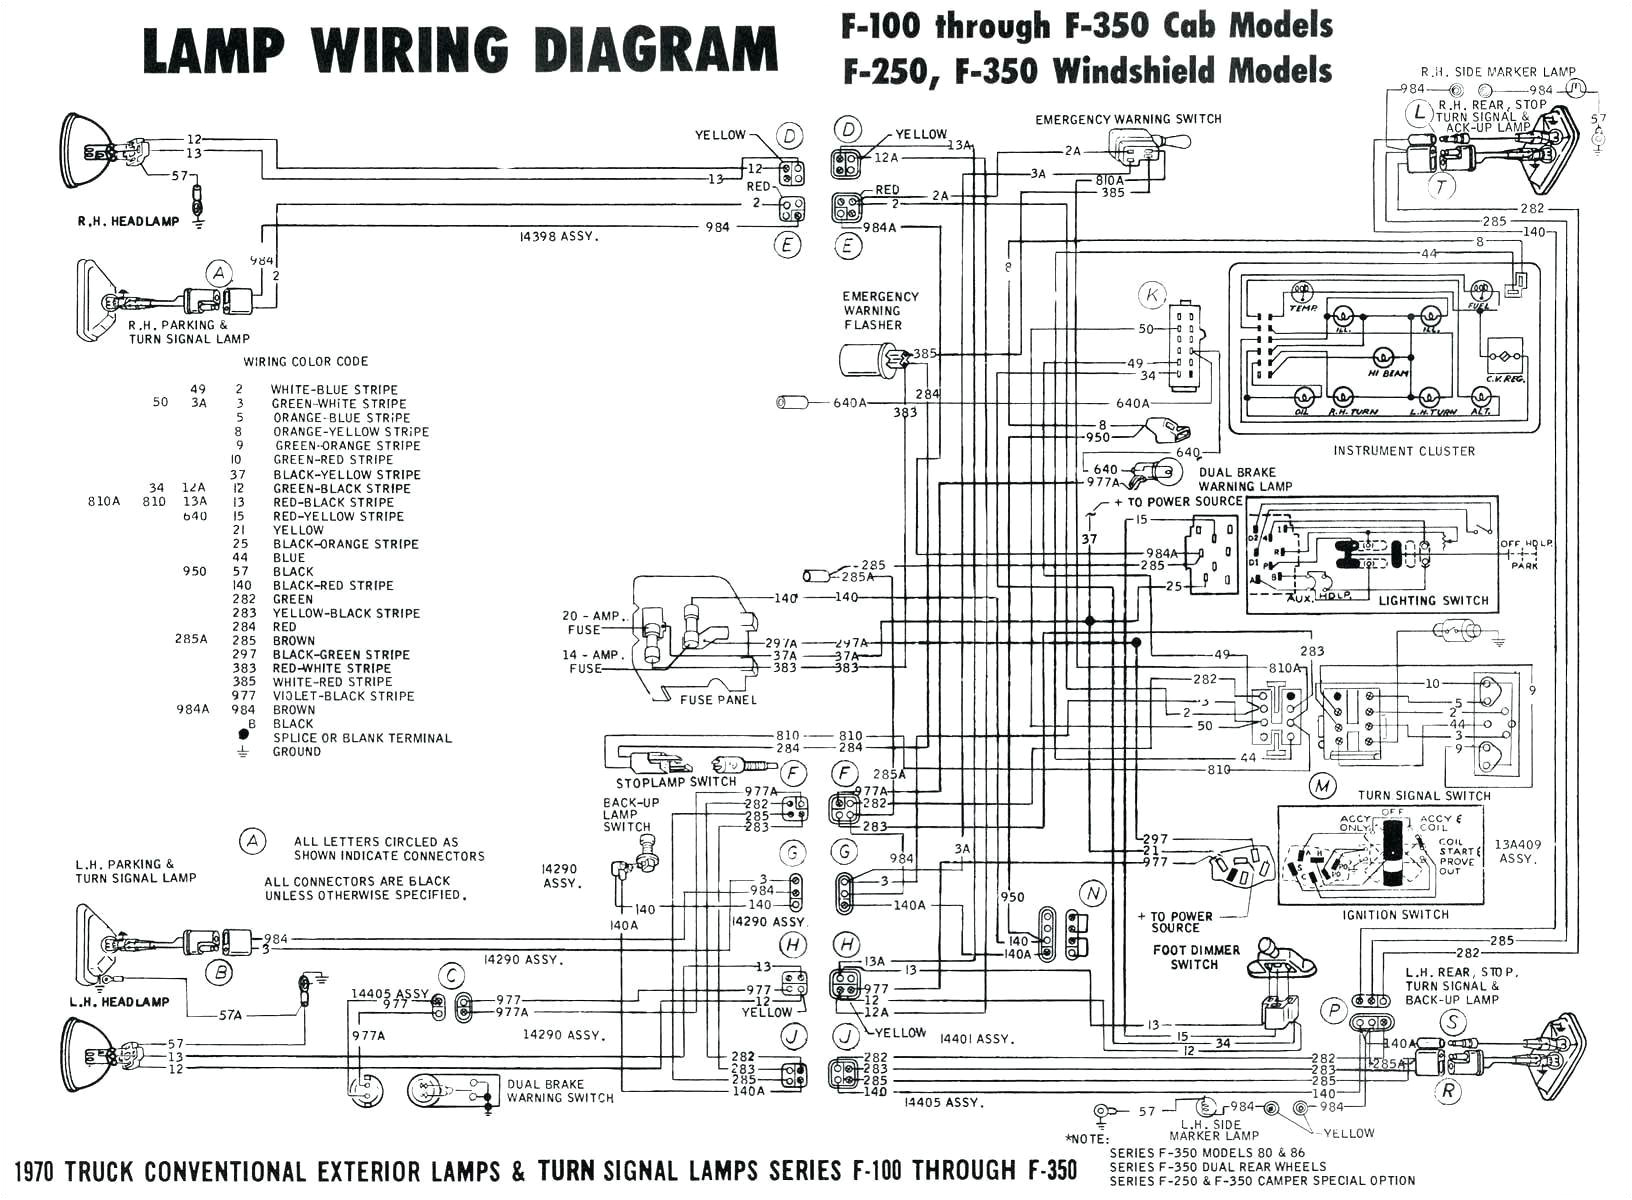 crane ignition wiring diagram wiring diagram technic crane hi 4 single fire ignition wiring diagram luxury